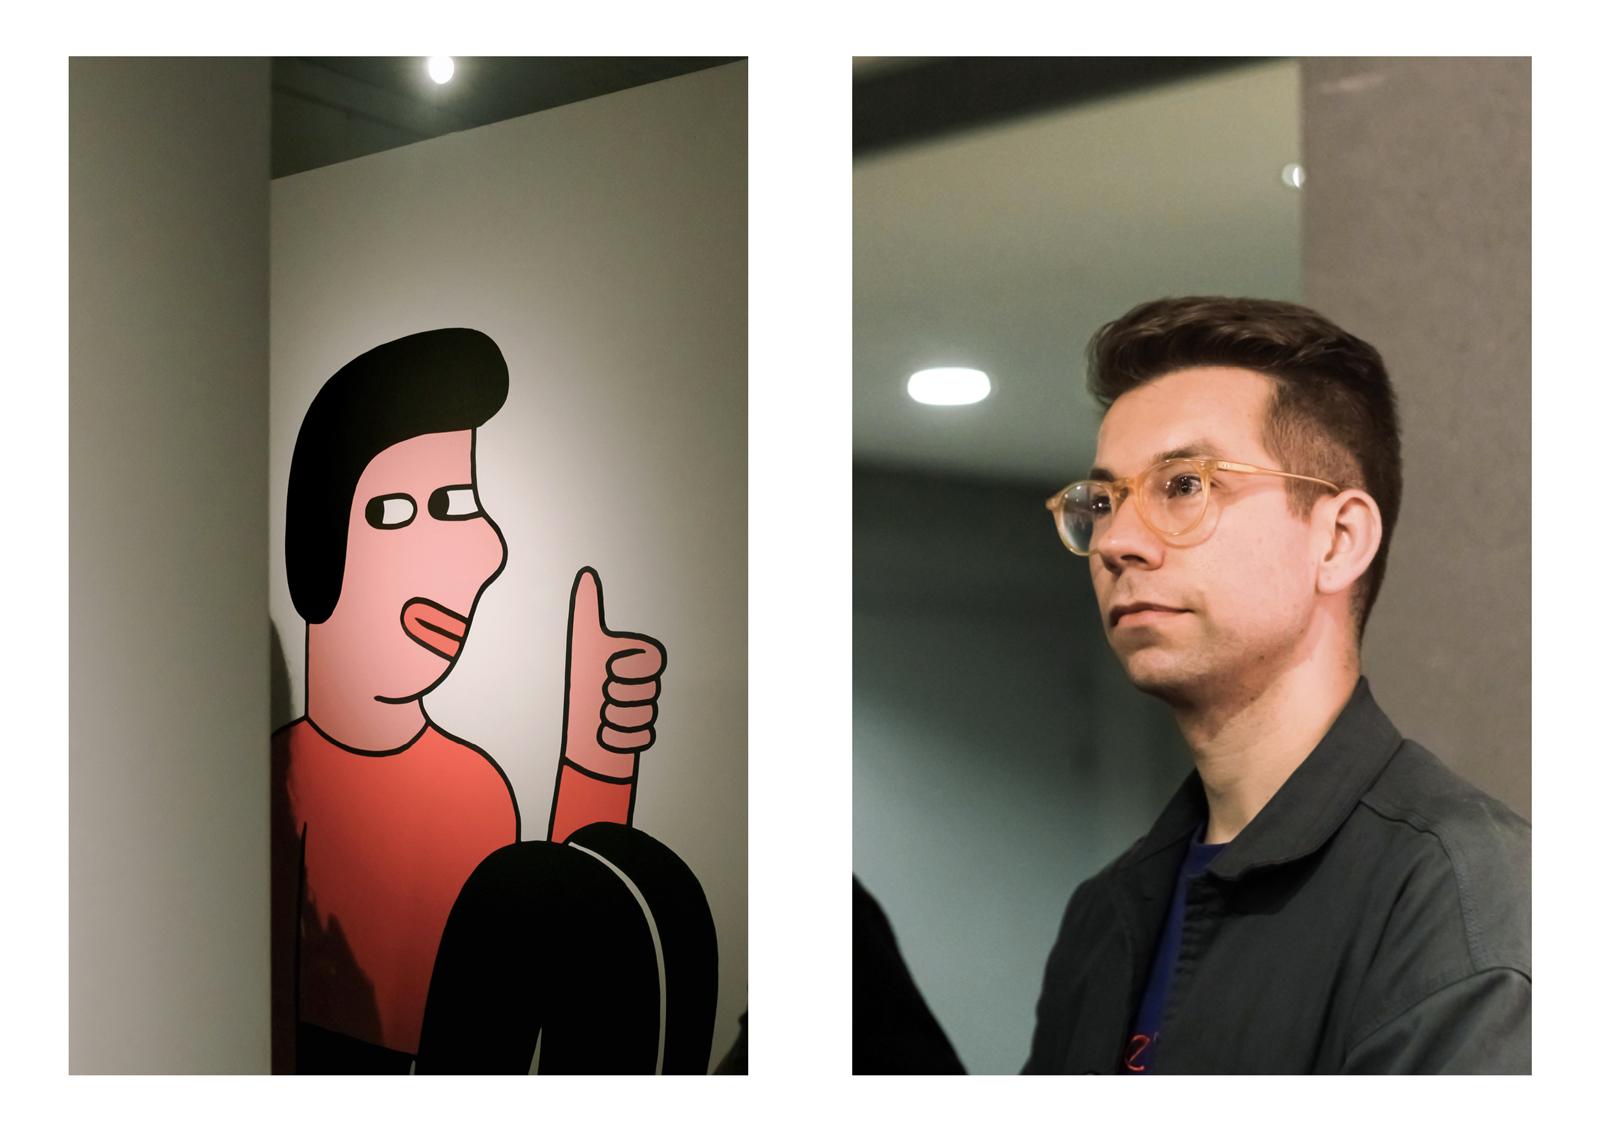 Andy Rementer @ Treviso Comic Book Festival